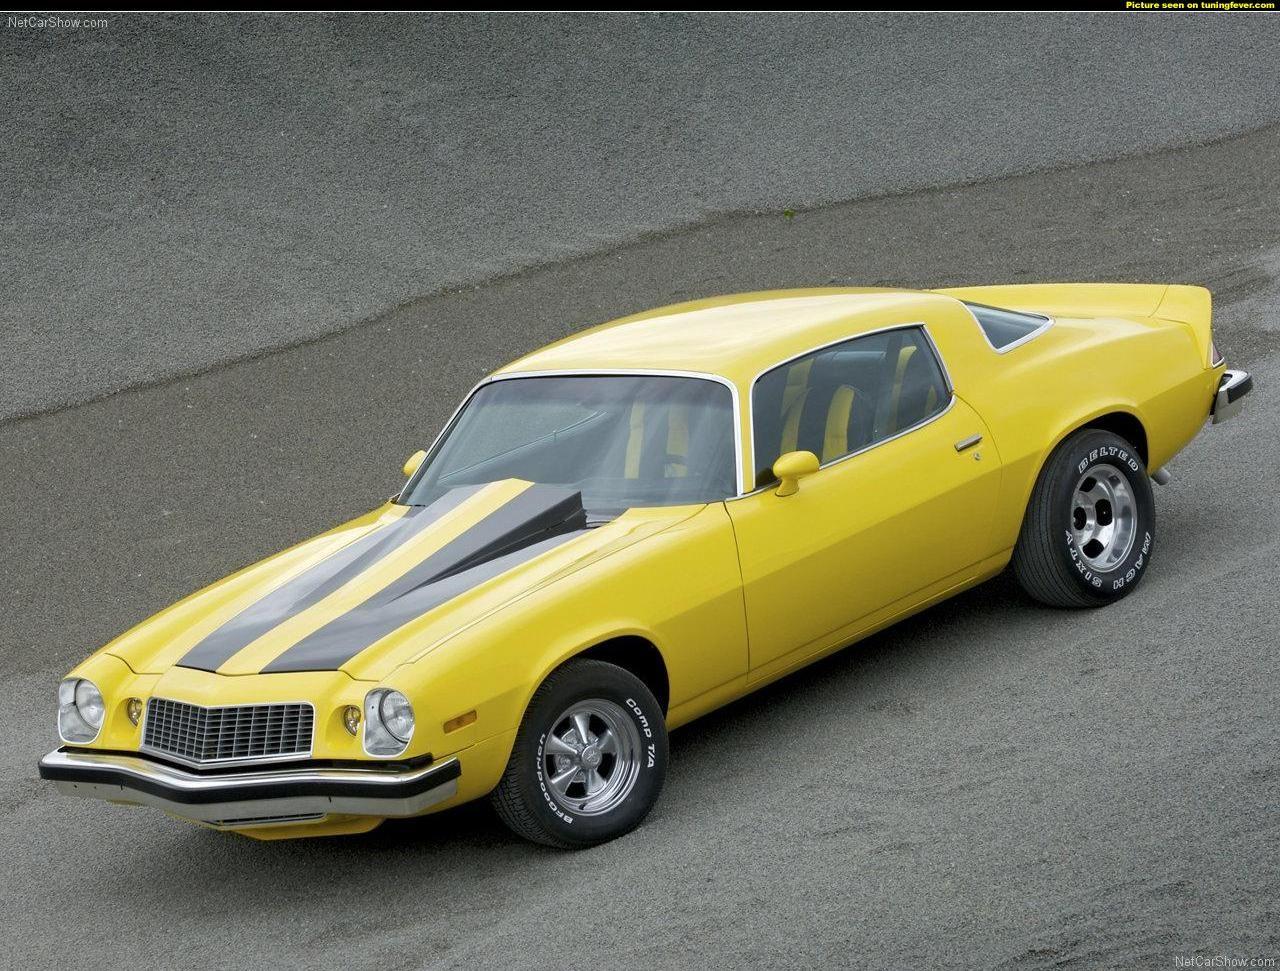 1976 camaro bumblebee | 1976 Chevrolet Camaro LT Rally Sport (Bumblebee)